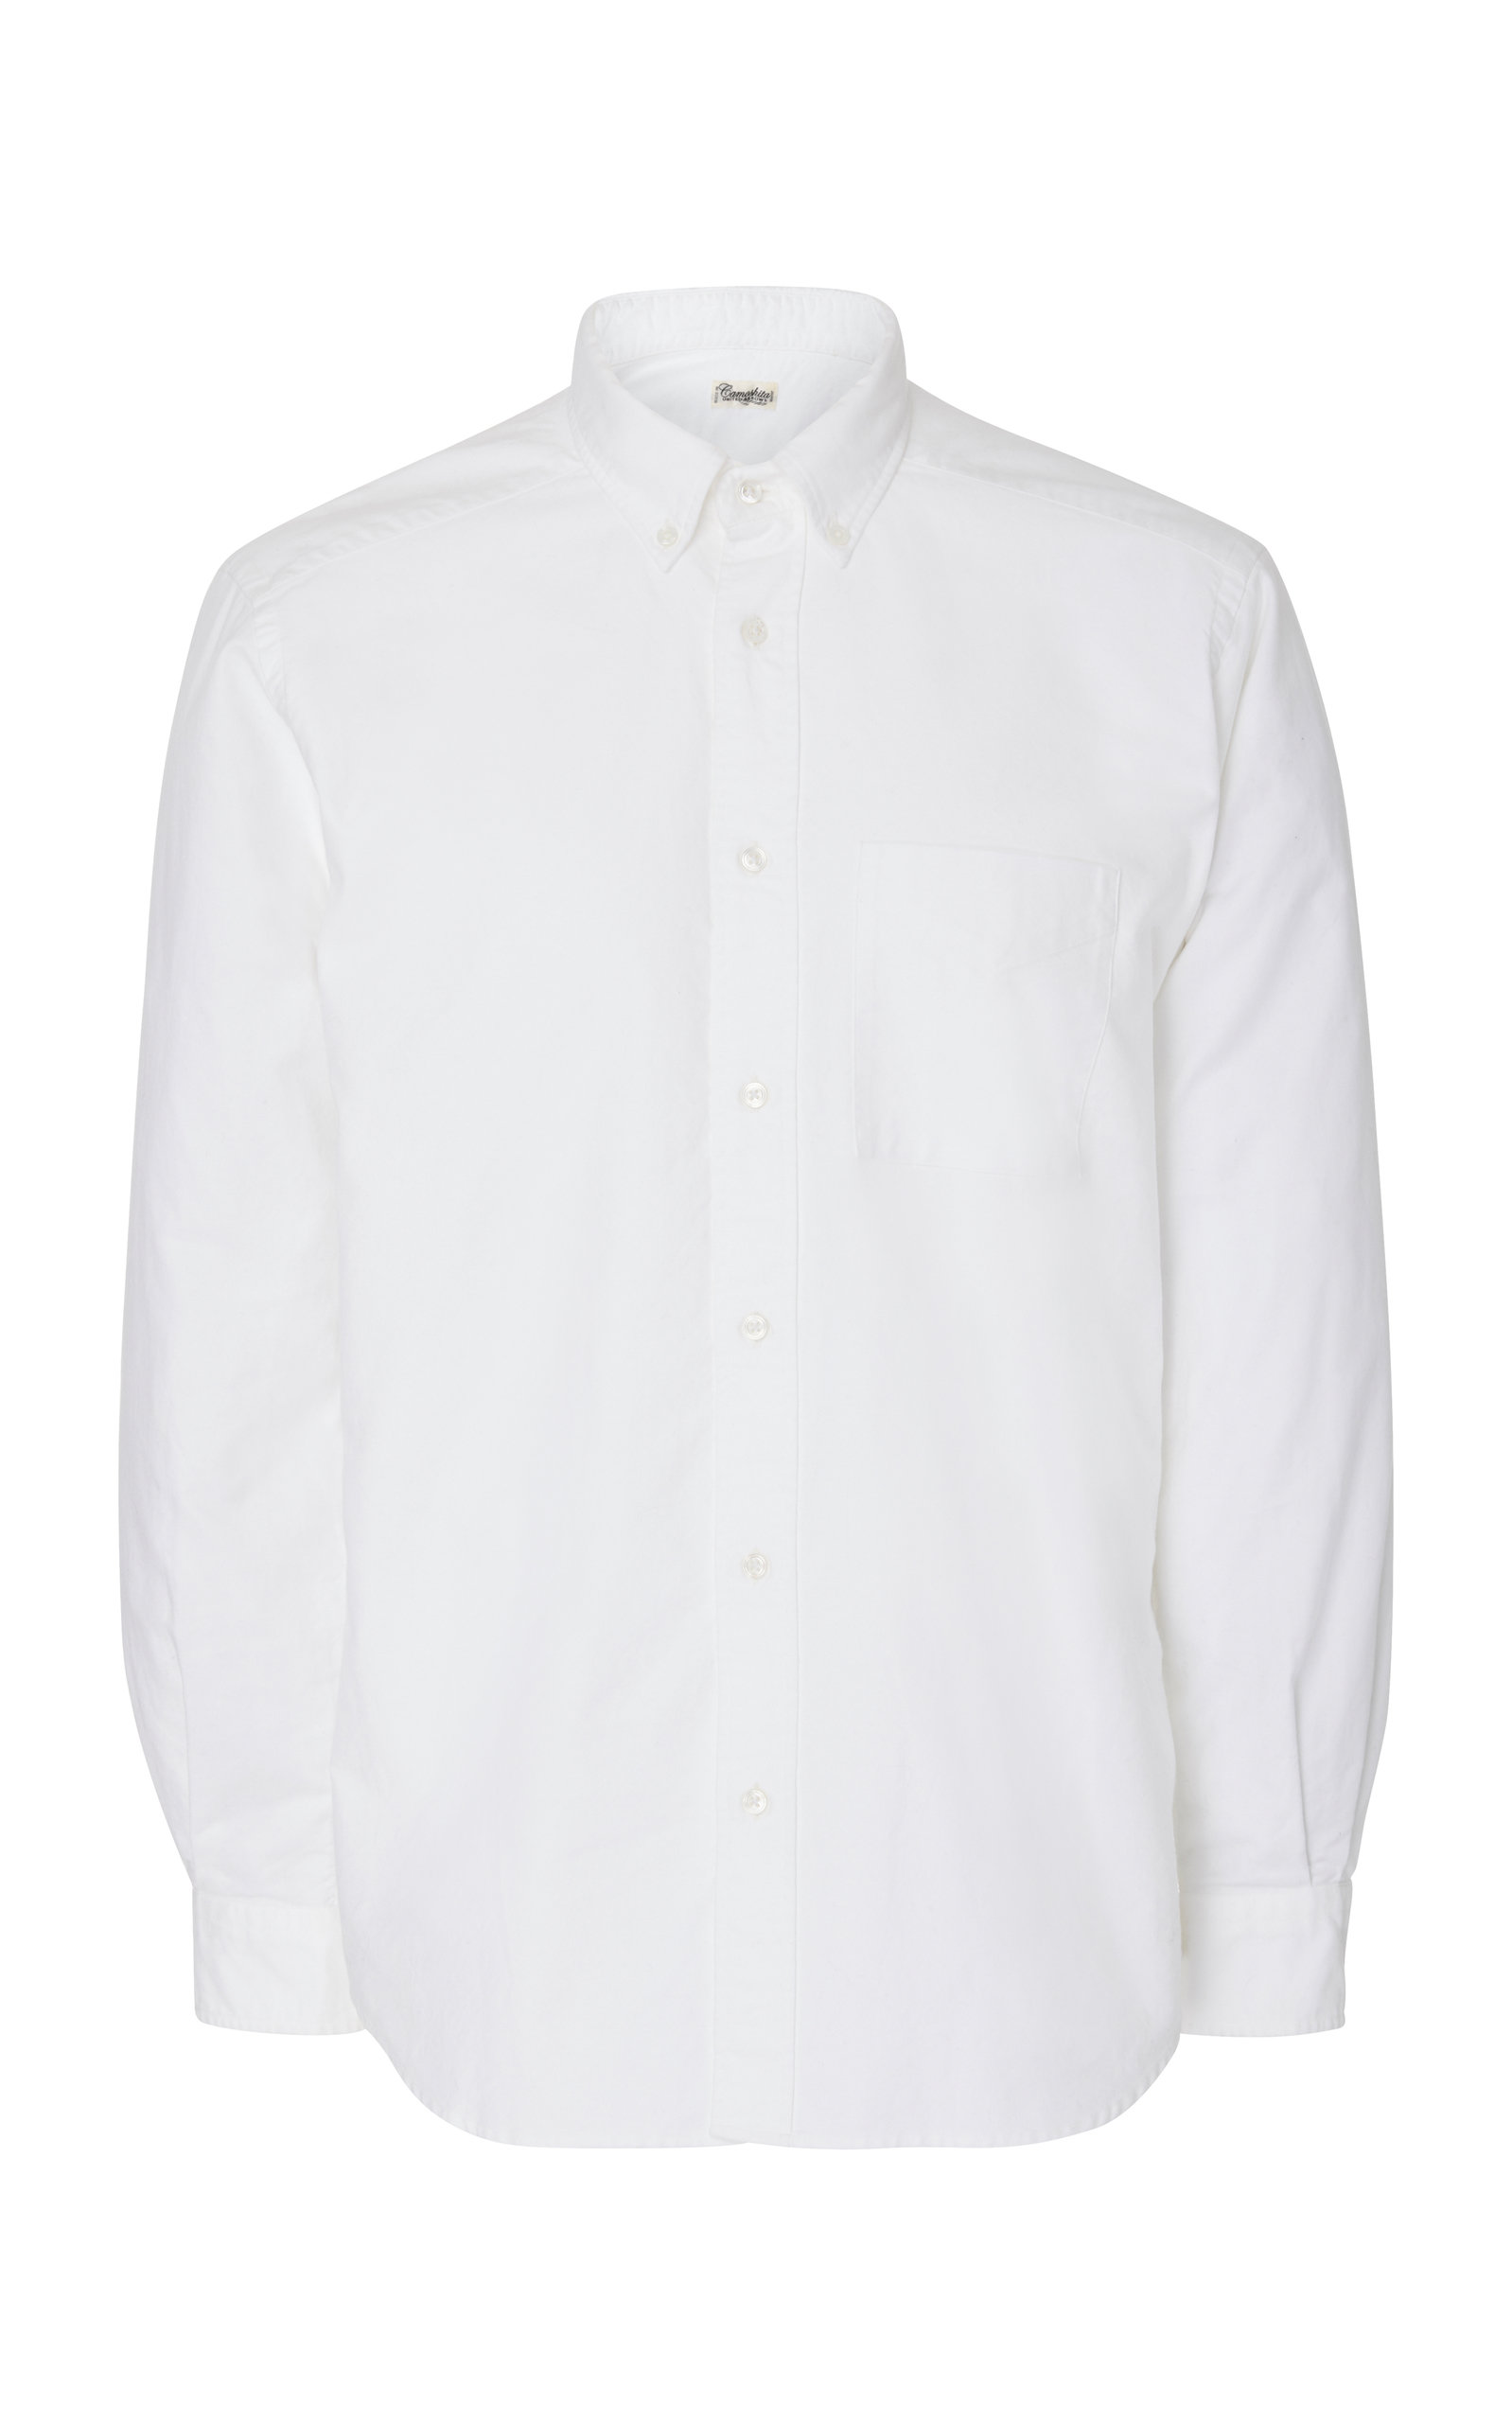 CAMOSHITA BUTTON-DOWN OXFORD DRESS SHIRT